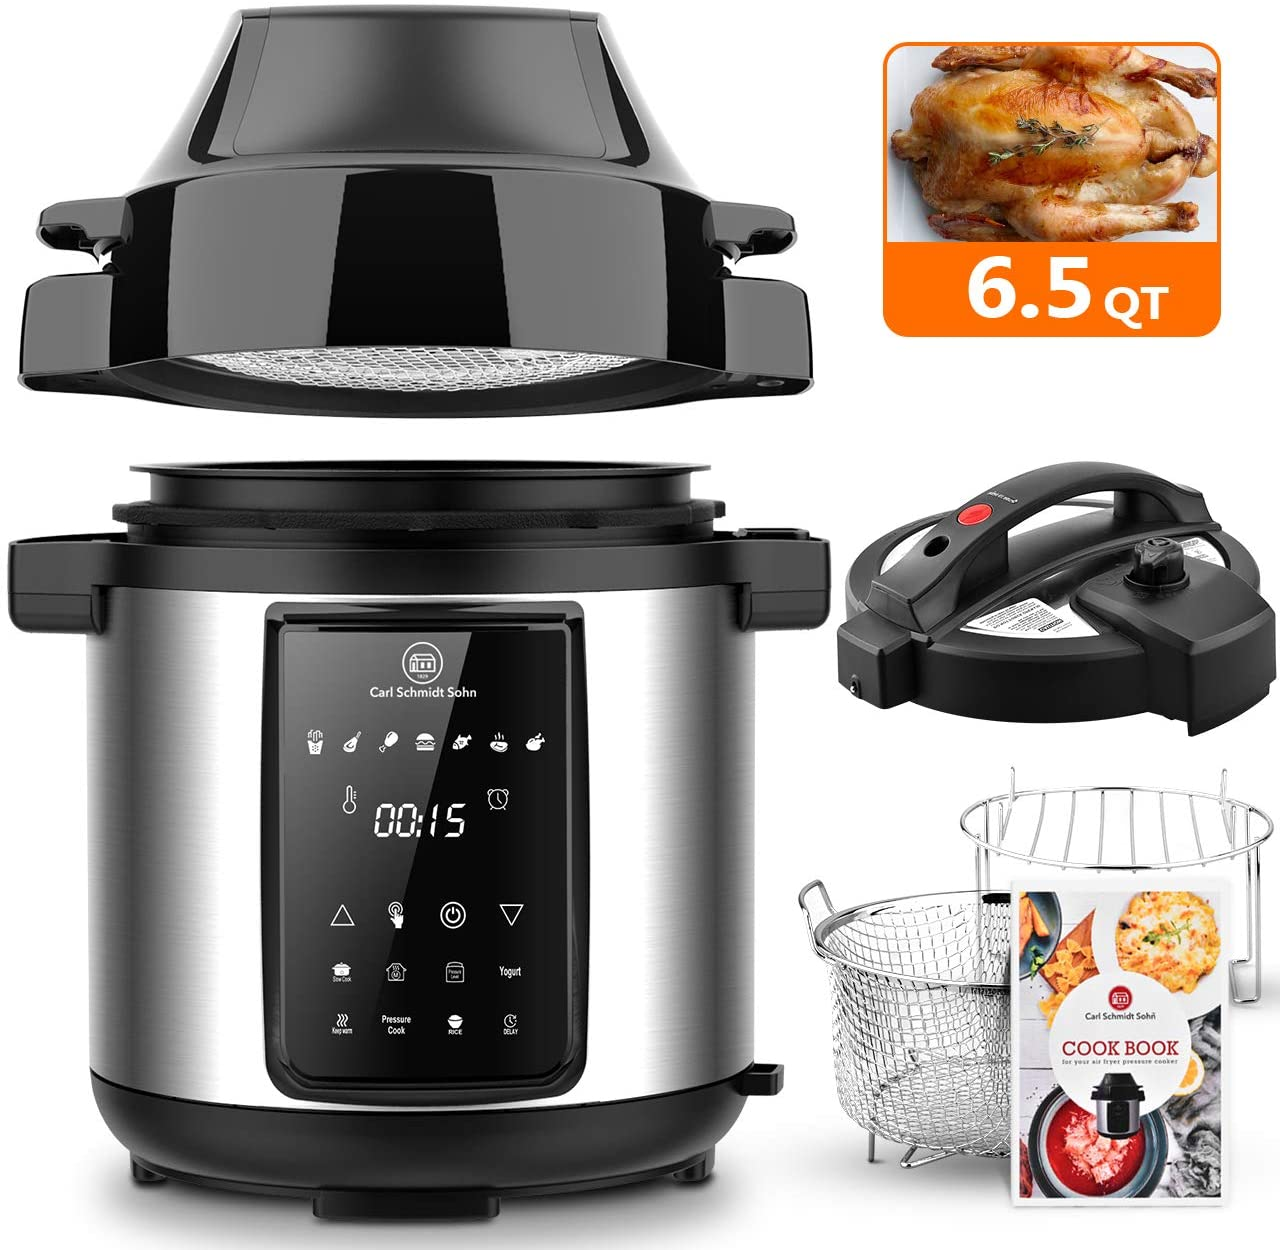 Carl Schmidt Sohn Pressure Cooker/Air Fryer Honest to goodness review